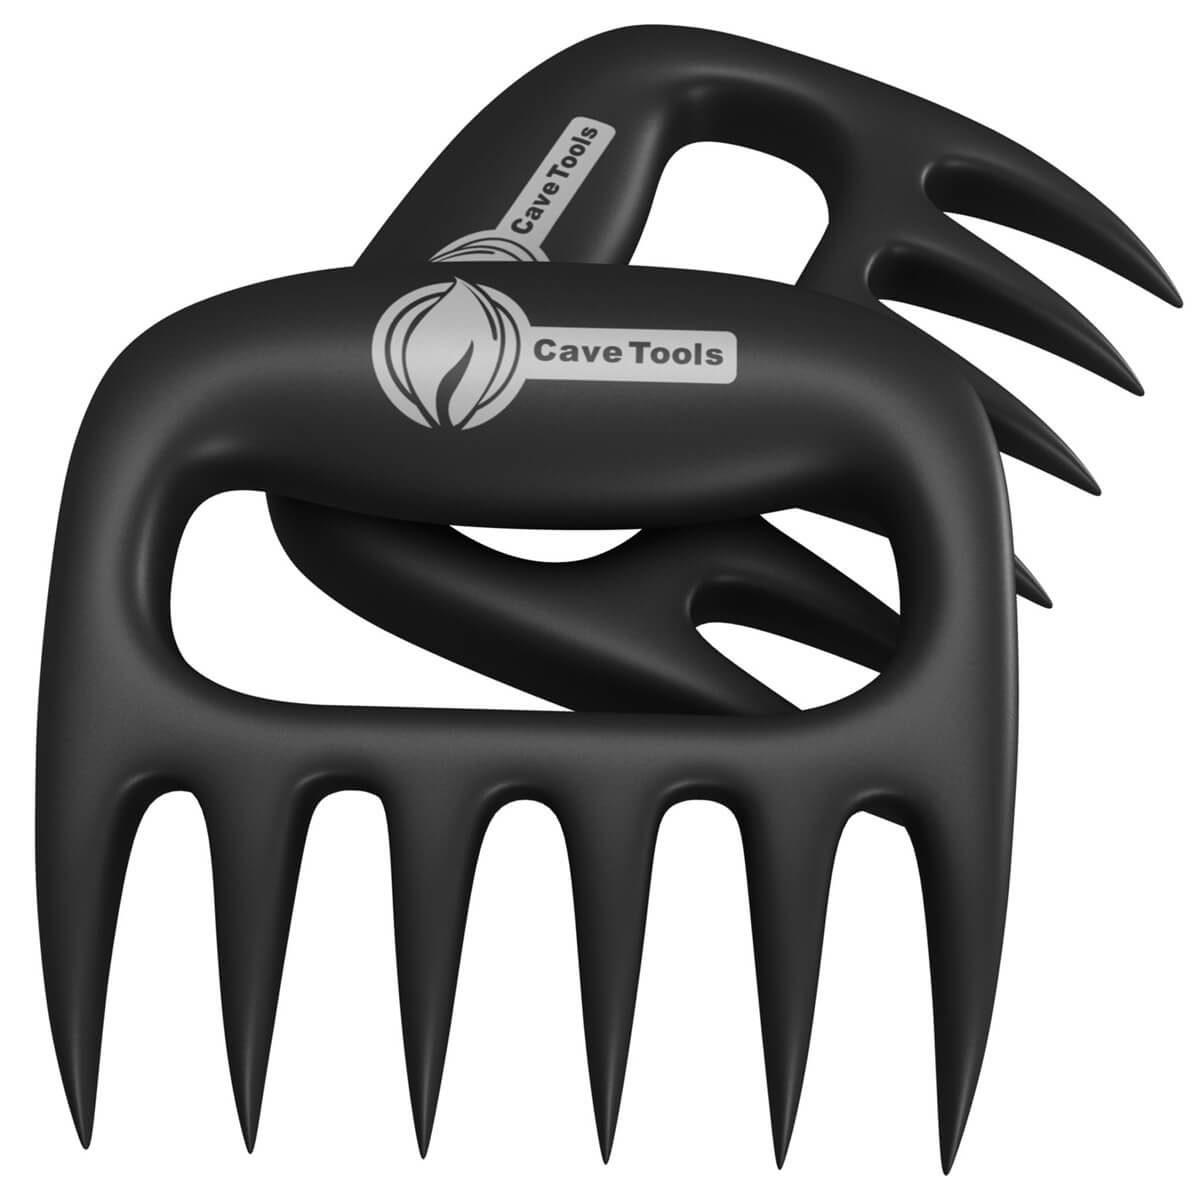 Shredder Claws BBQ meat grilling